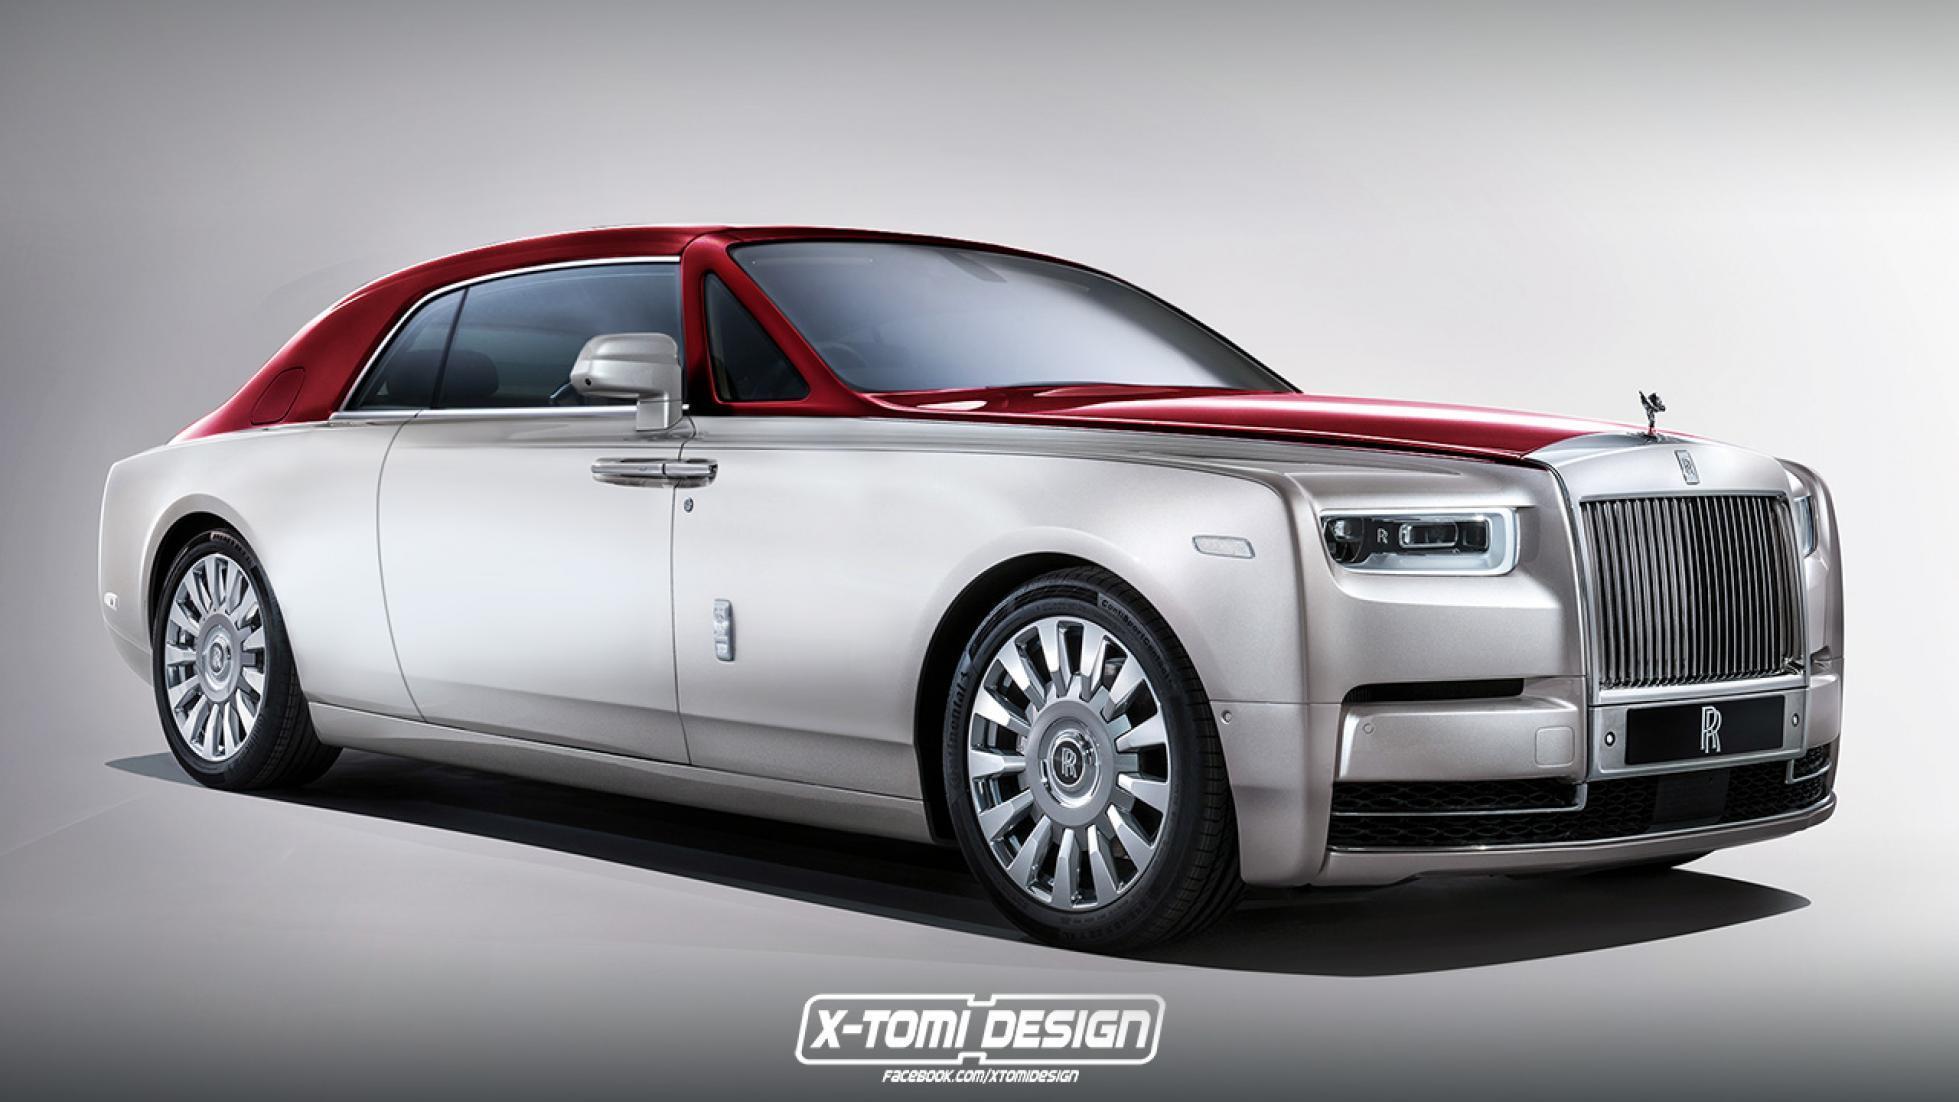 Luxury Vehicles More On Luxury Vehicles Topgear India